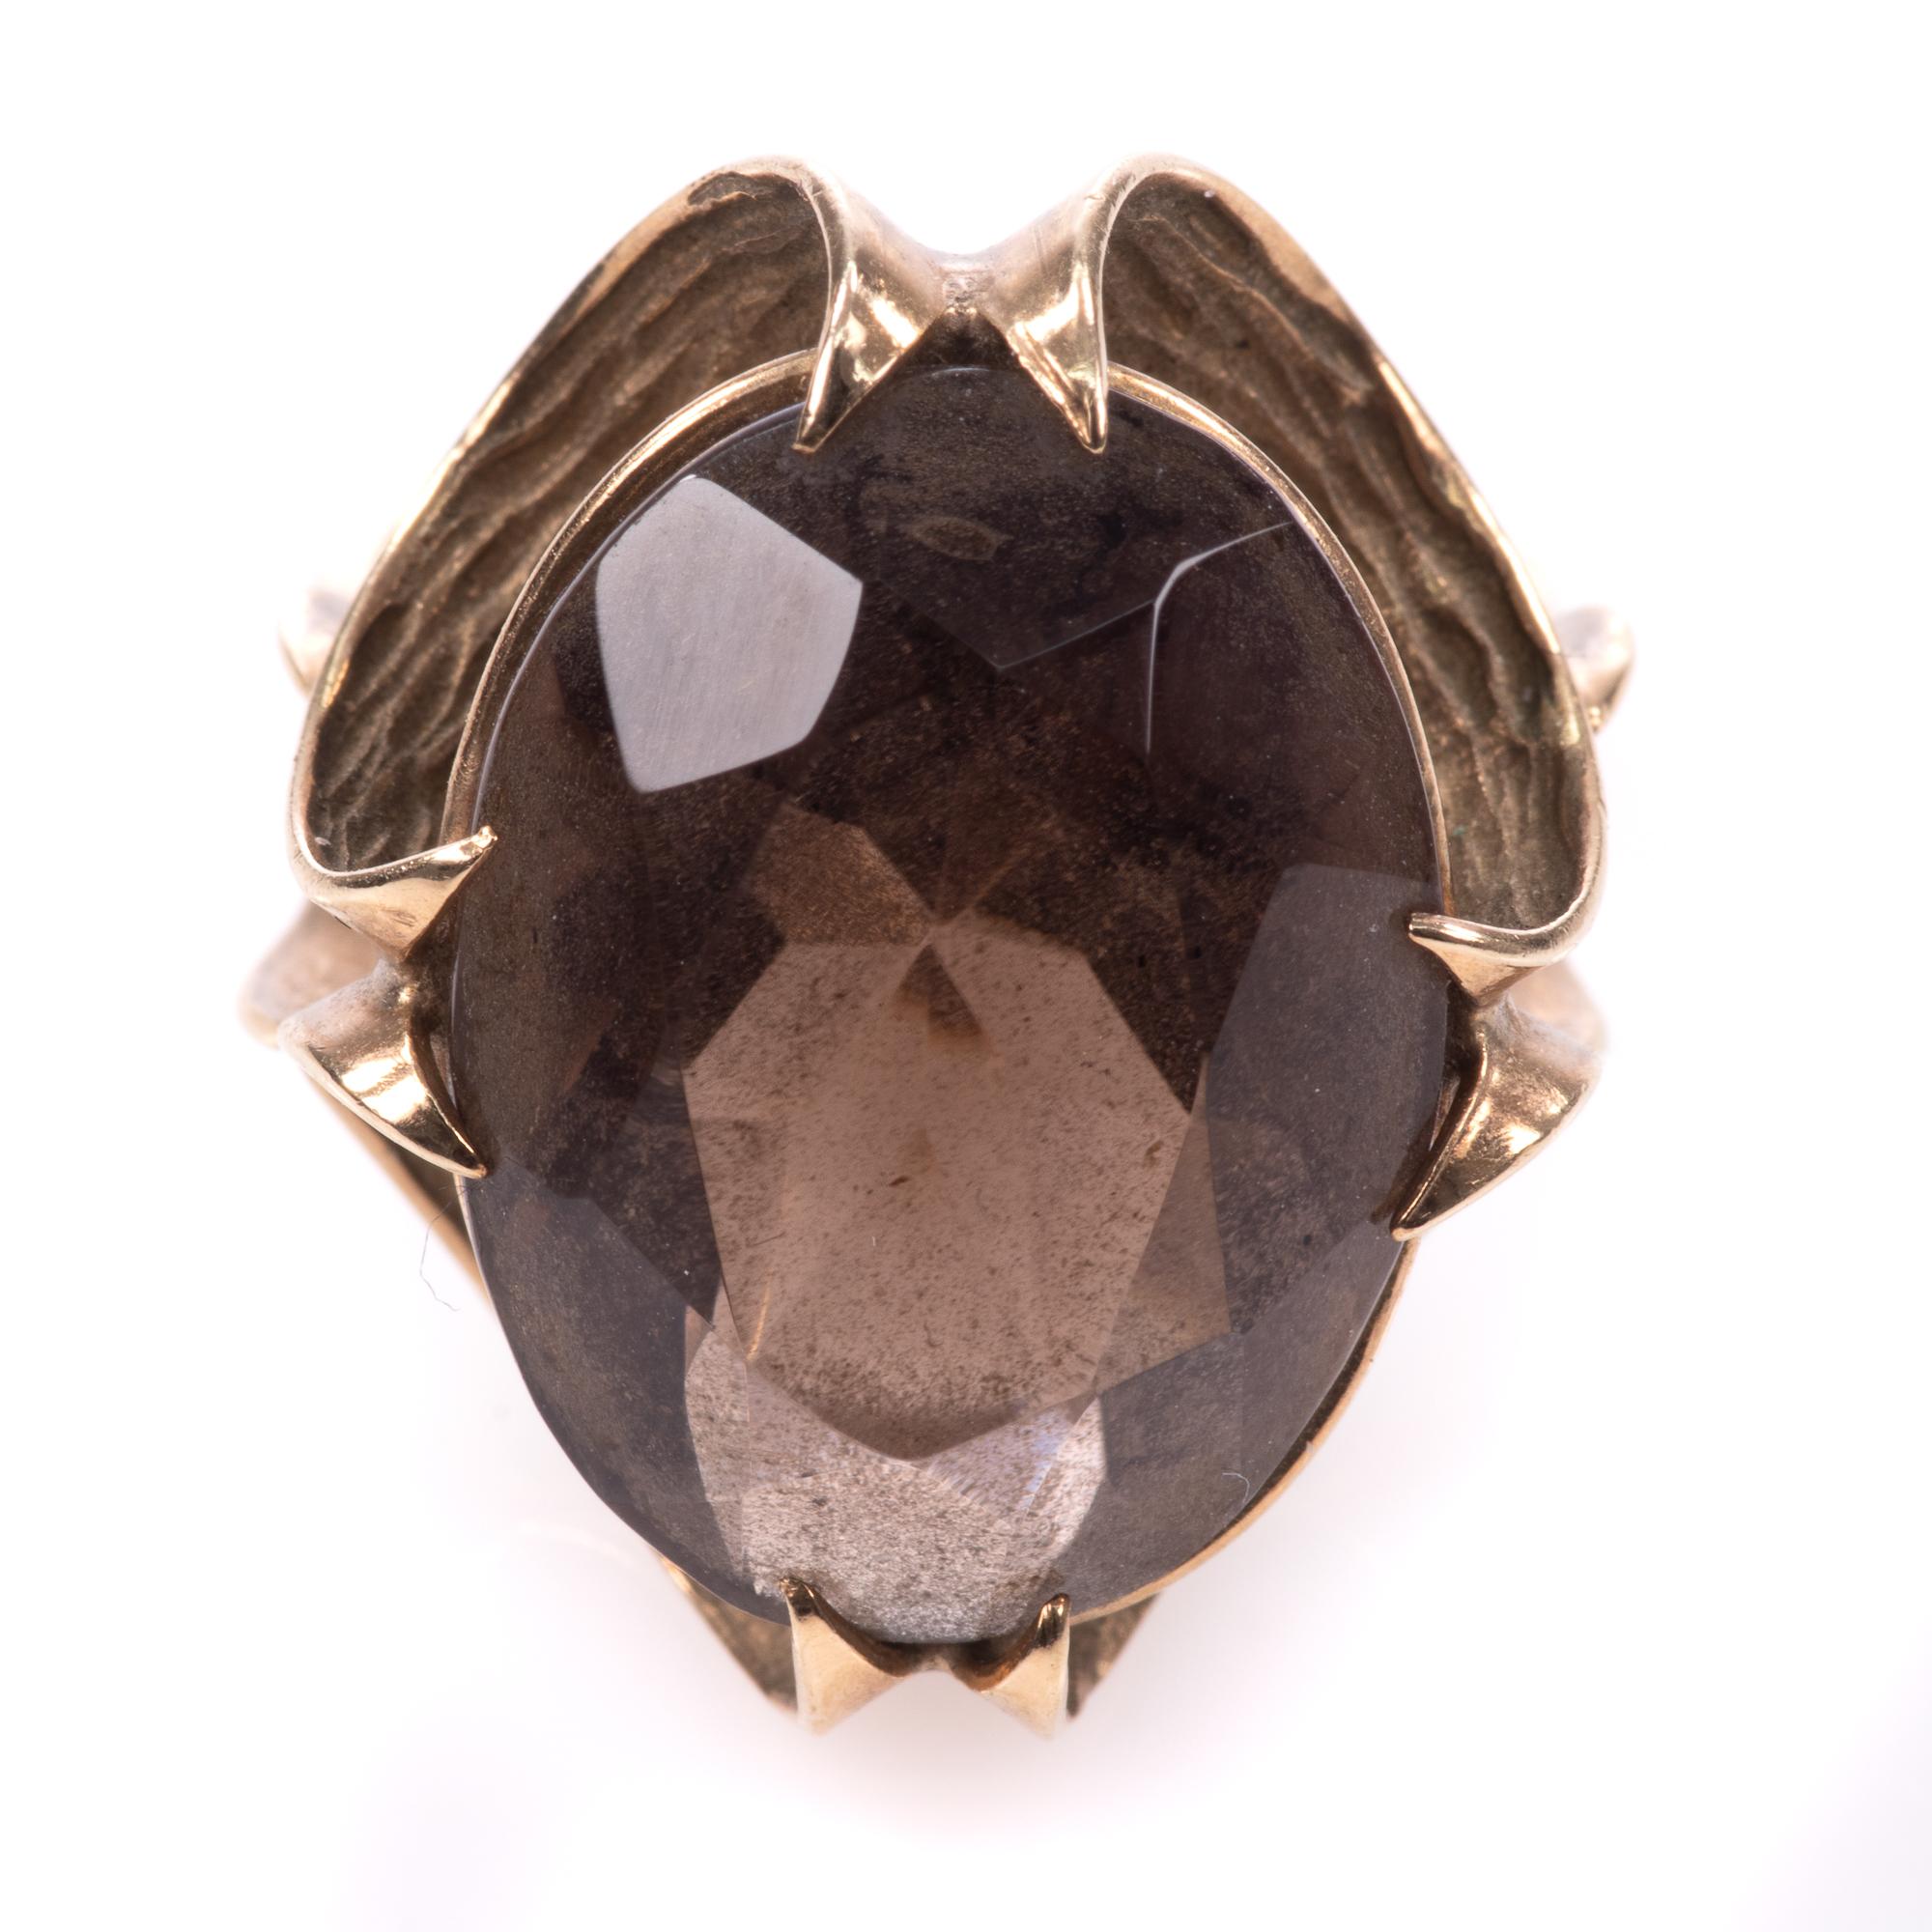 9ct Gold 12.75ct Smoky Quartz Ring - Image 3 of 7